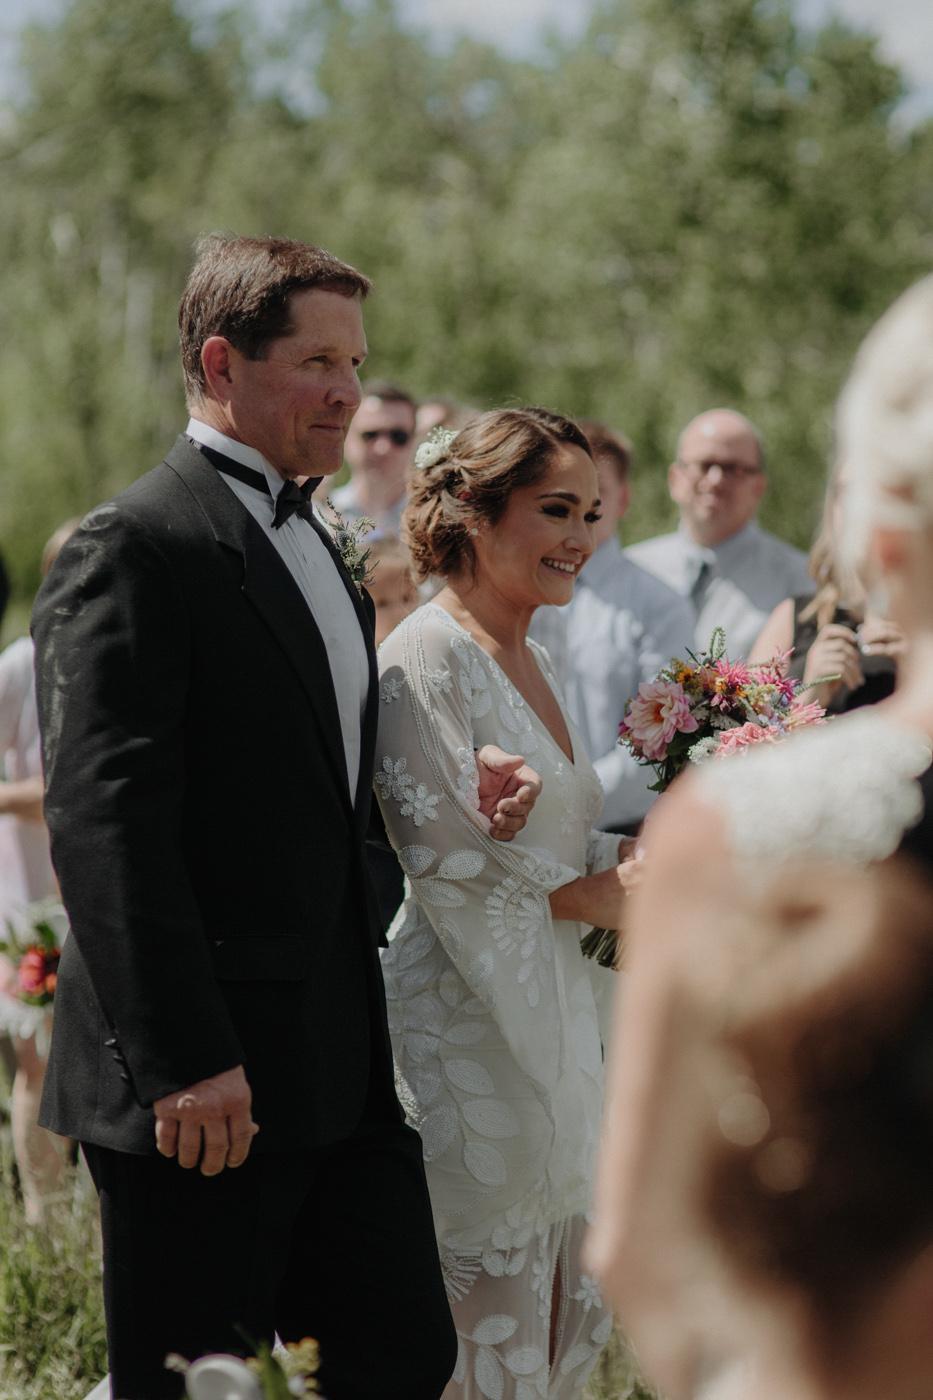 woods-walk-trail-crested-butte-colorado-wedding-37.jpg